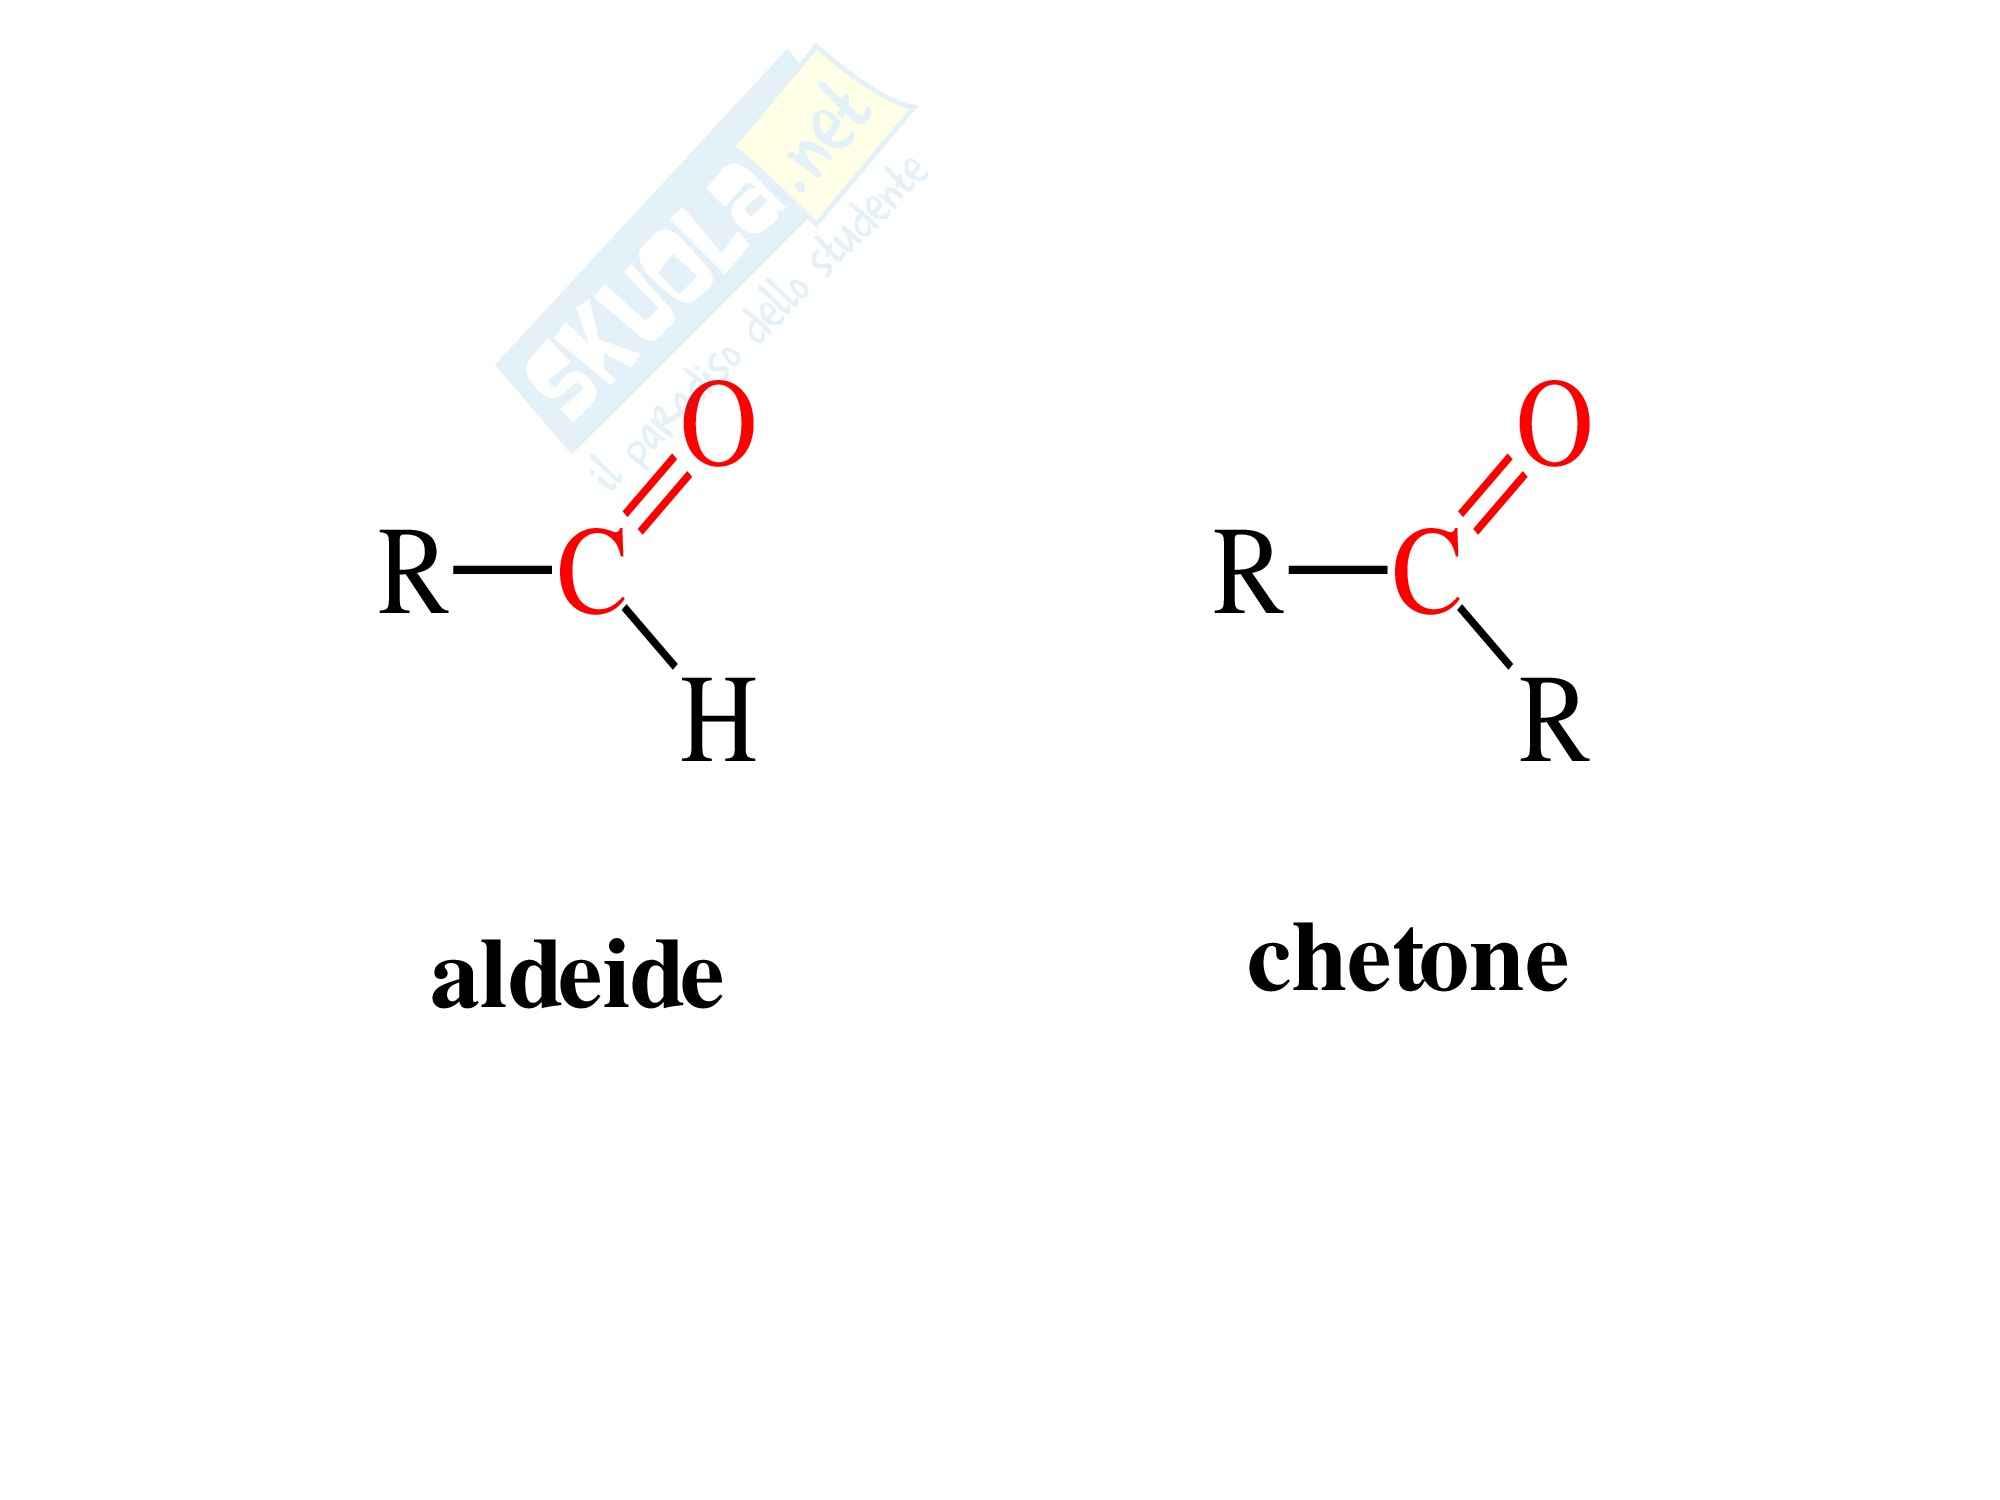 appunto N. Capitanio Chimica e propedeutica biochimica